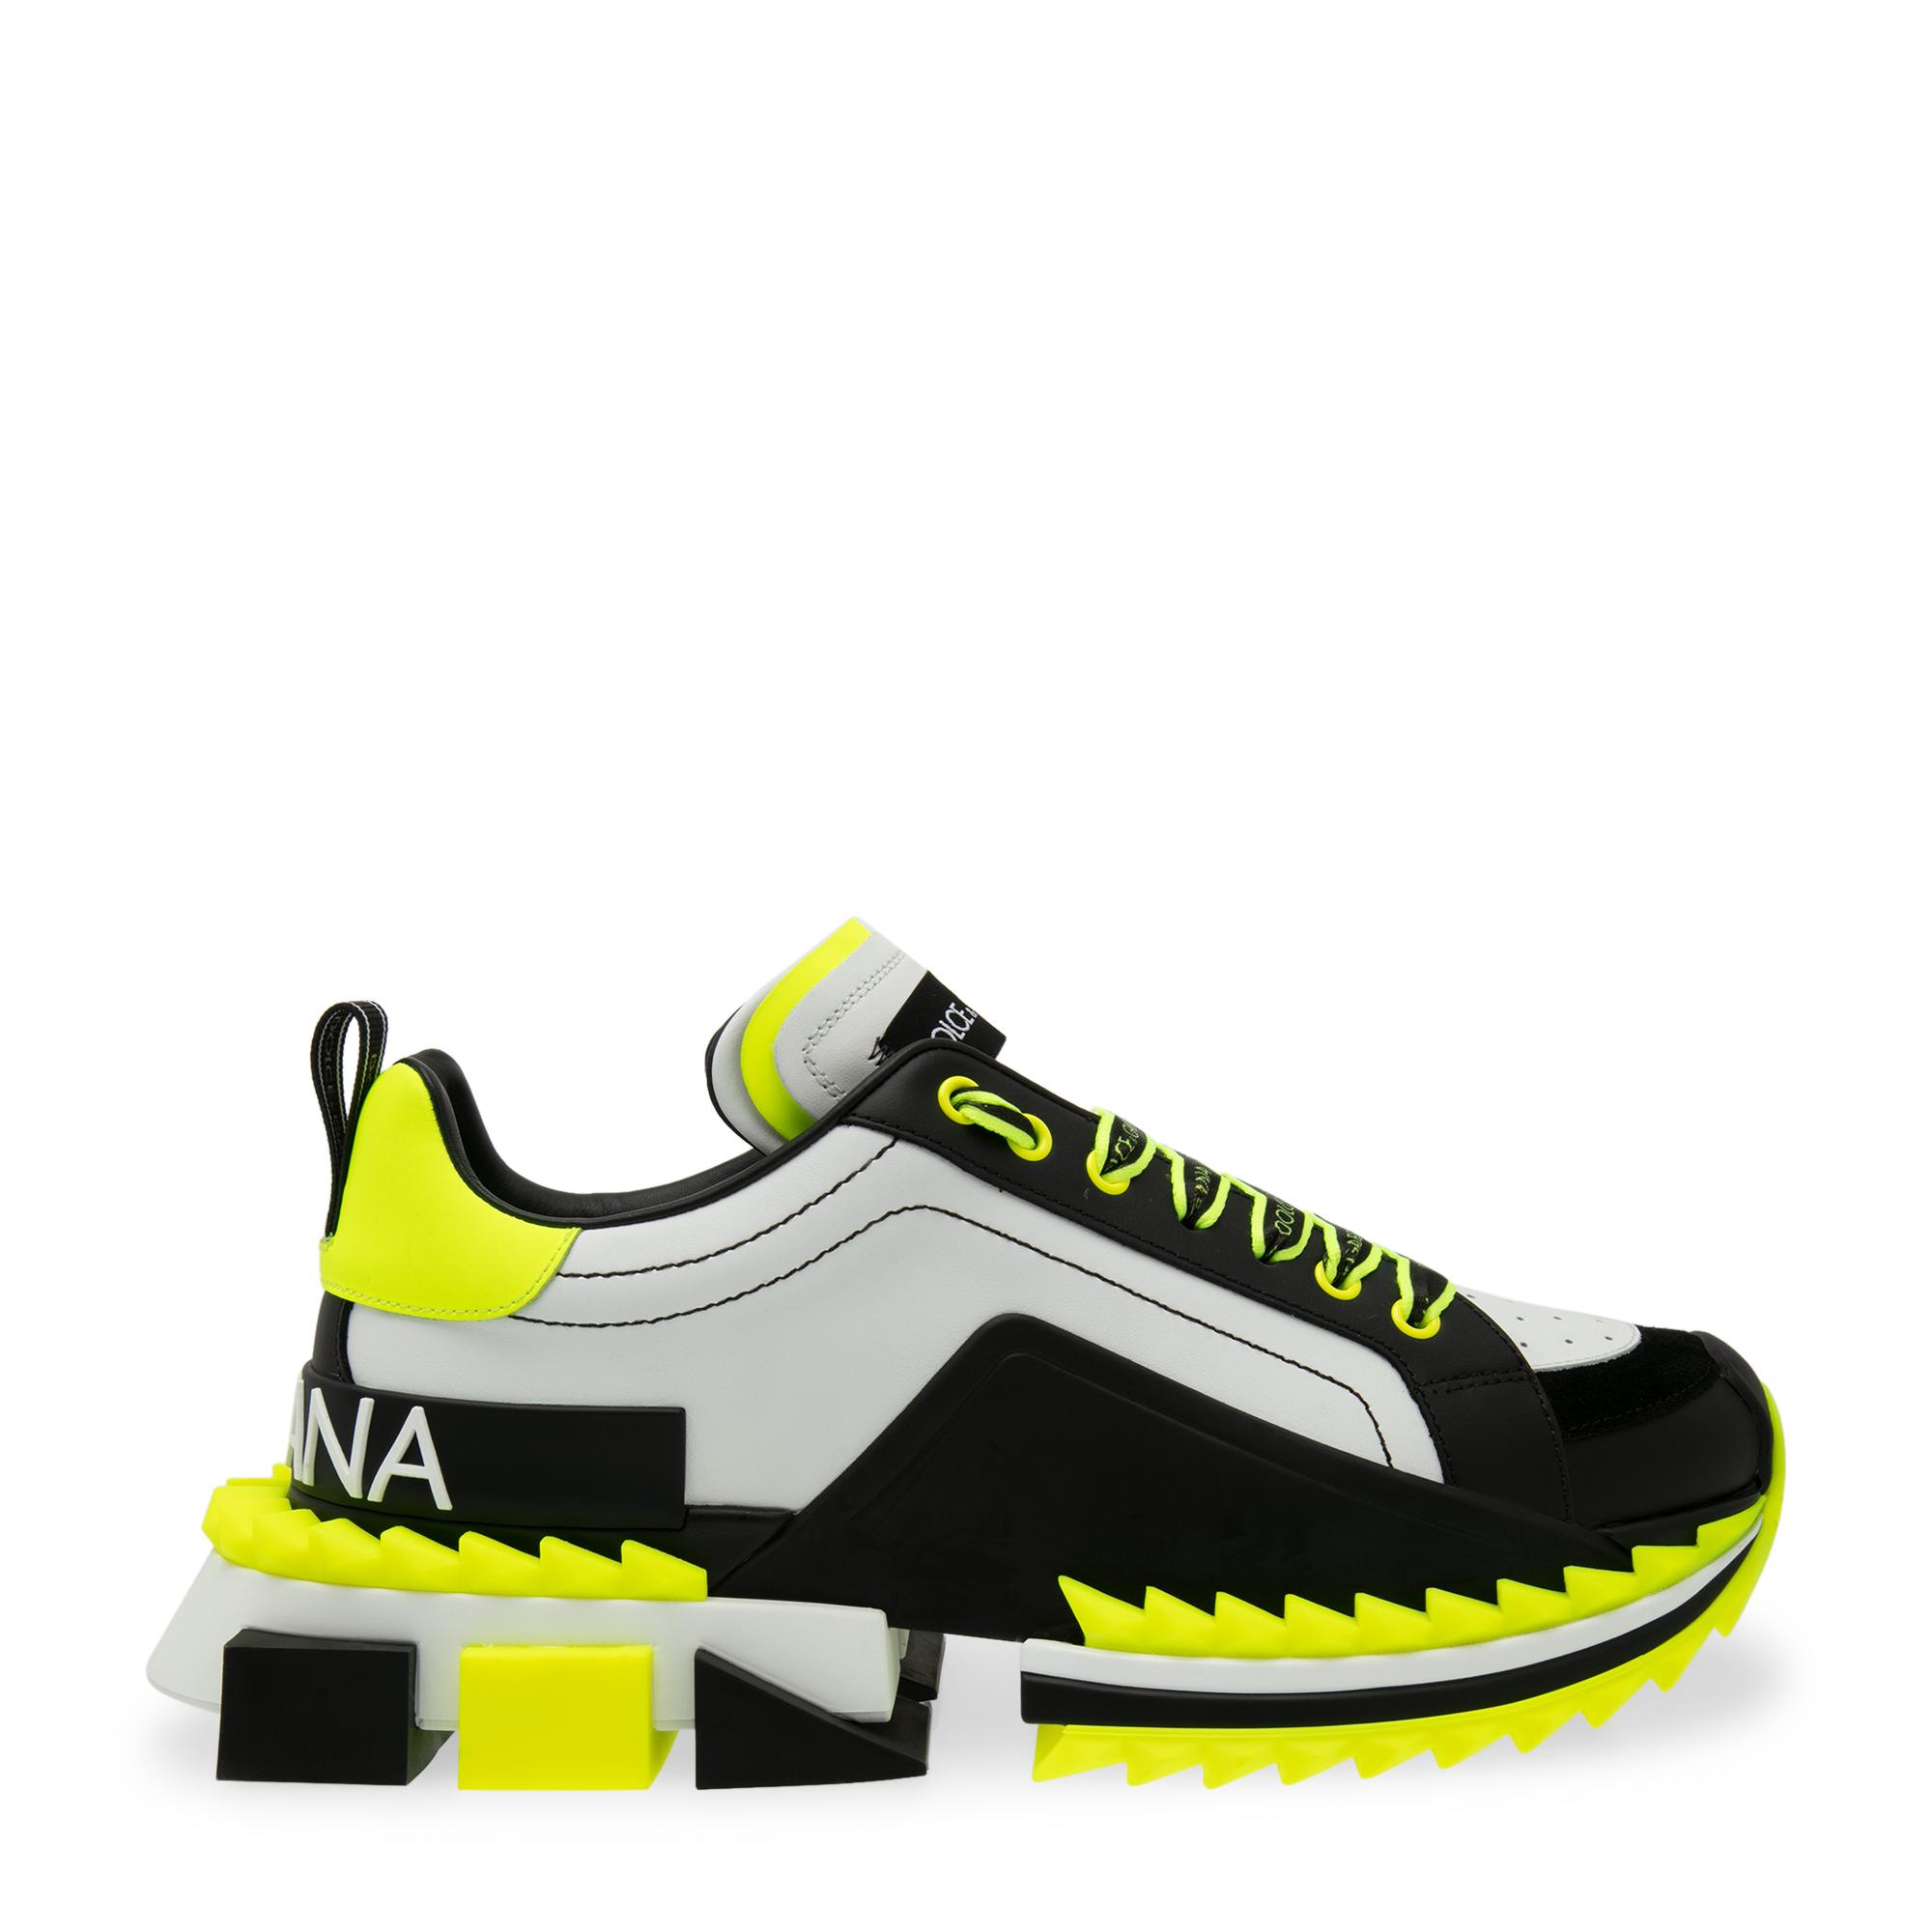 Super King sneakers